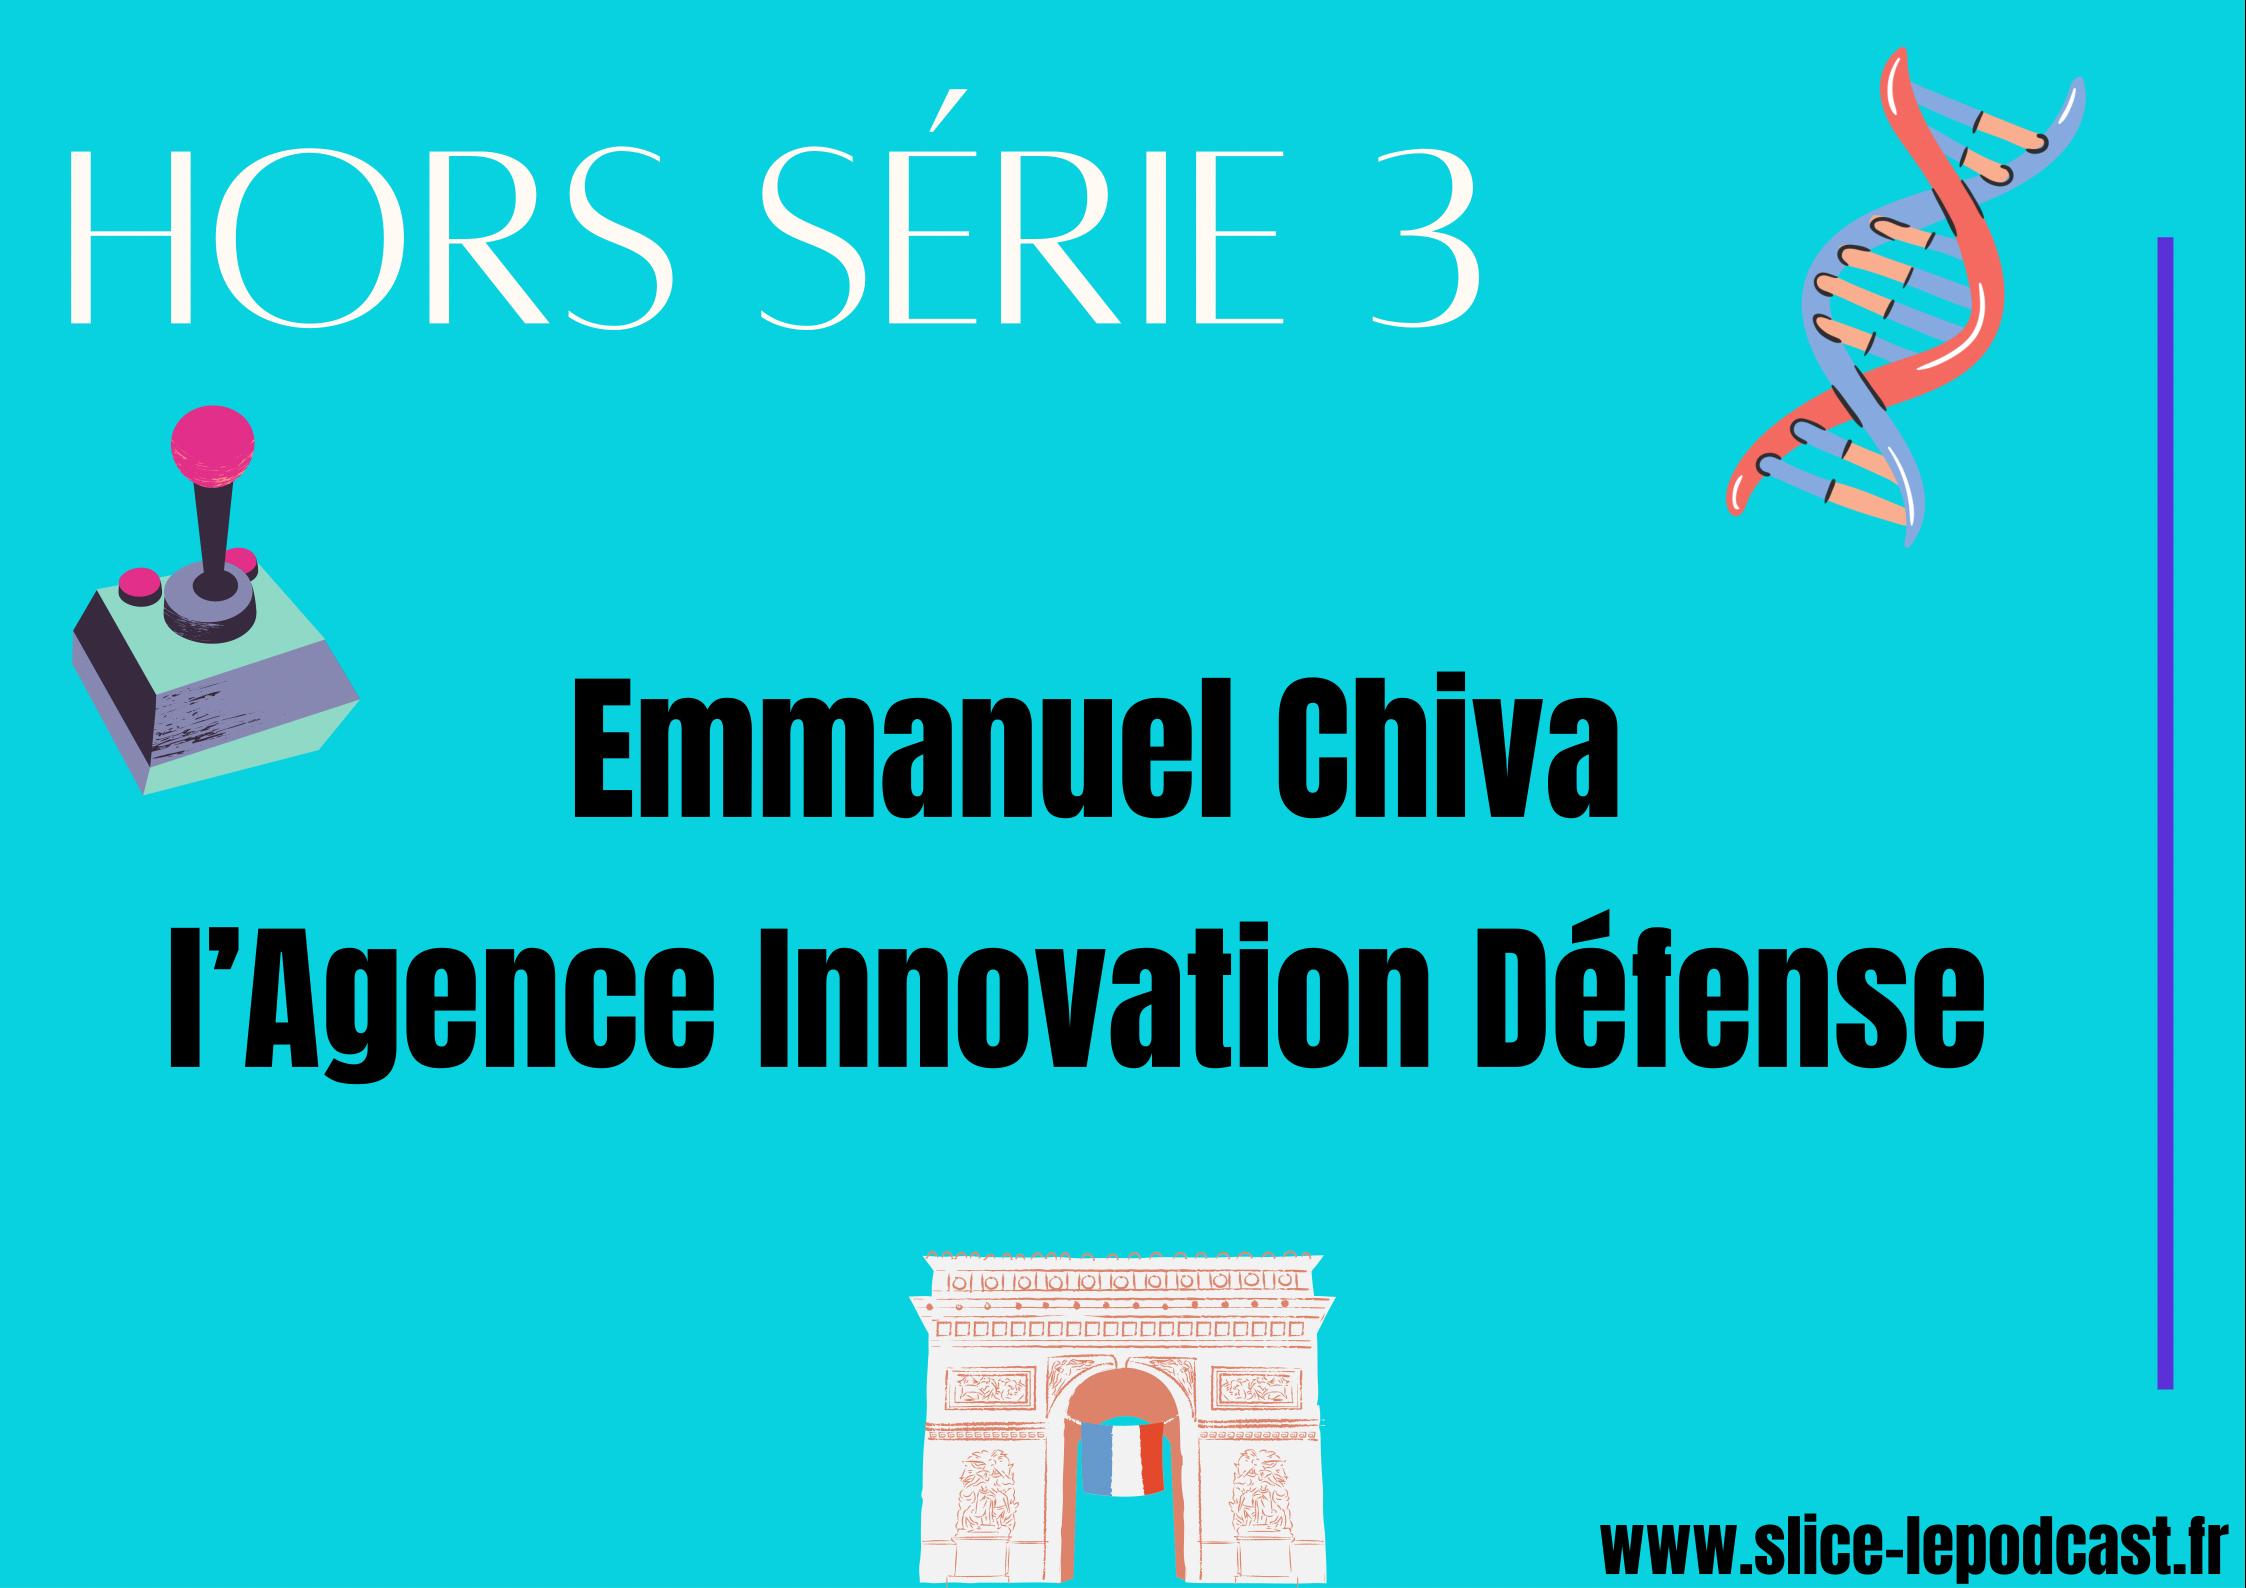 Hors série 3 : Emmanuel Chiva et l'Agence Innovation Défense